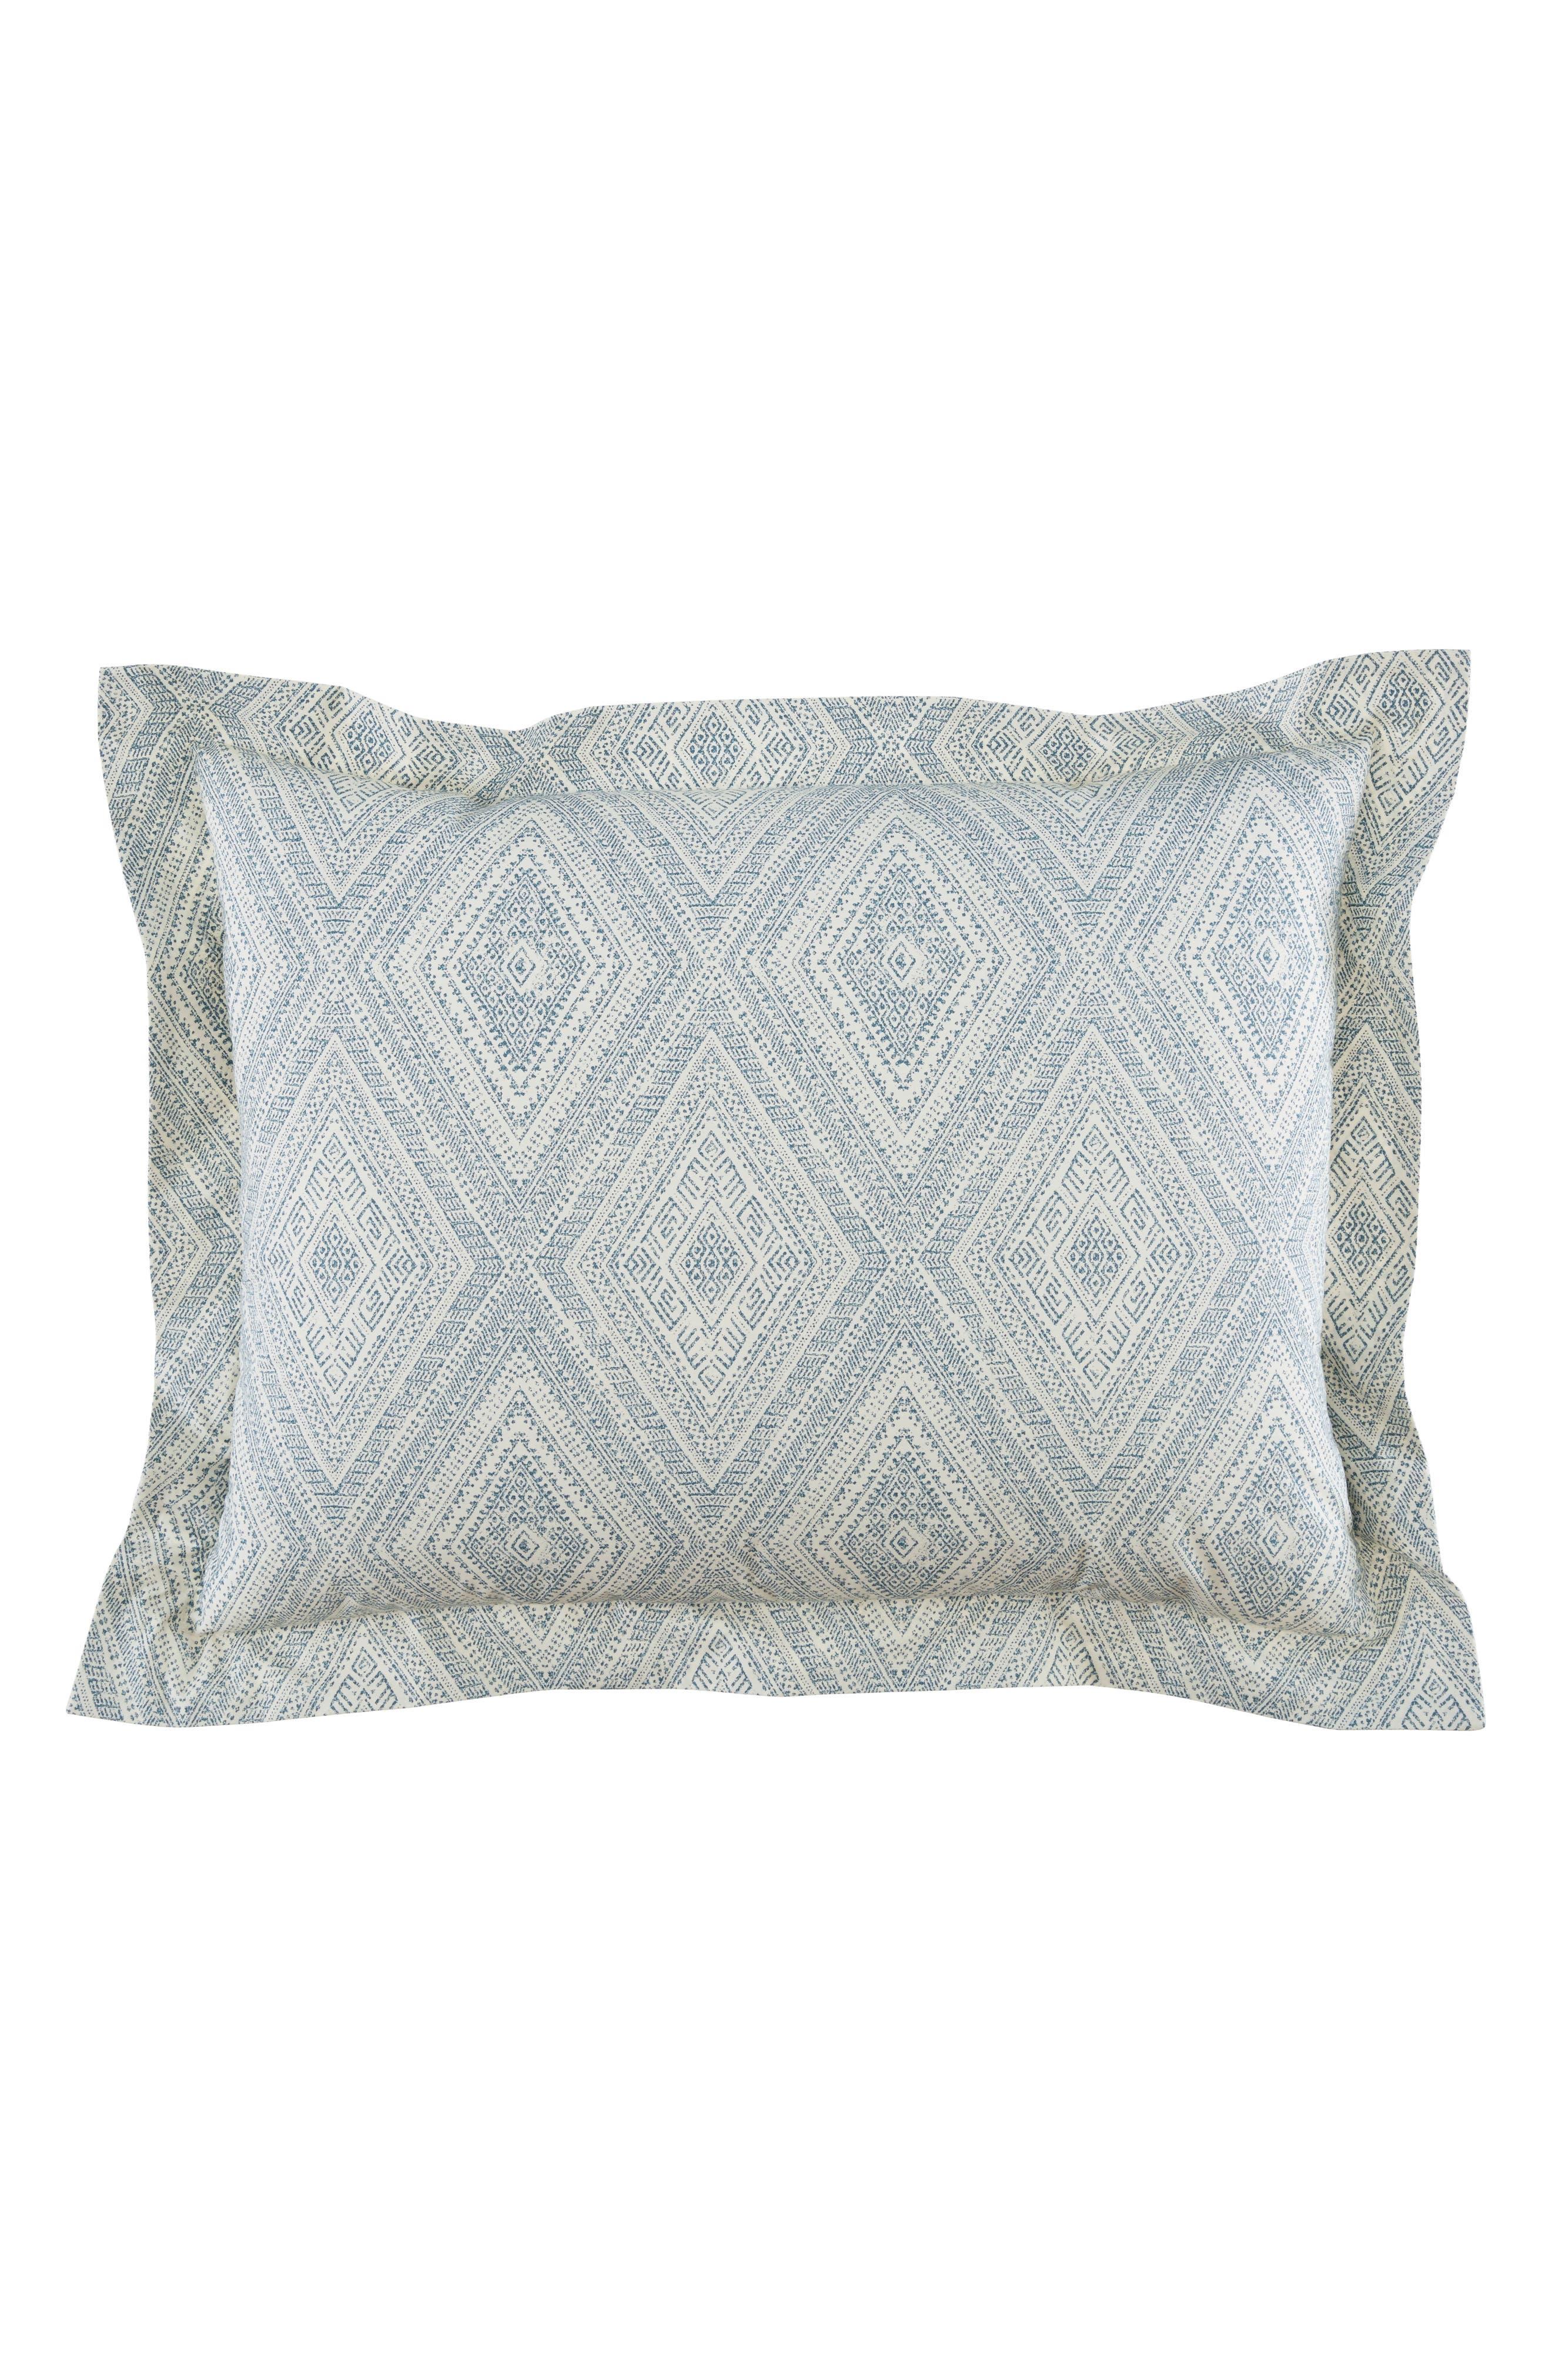 Caspiane 200 Thread Count Pair of Pillow Shams,                             Main thumbnail 1, color,                             Turquoise/ Aqua